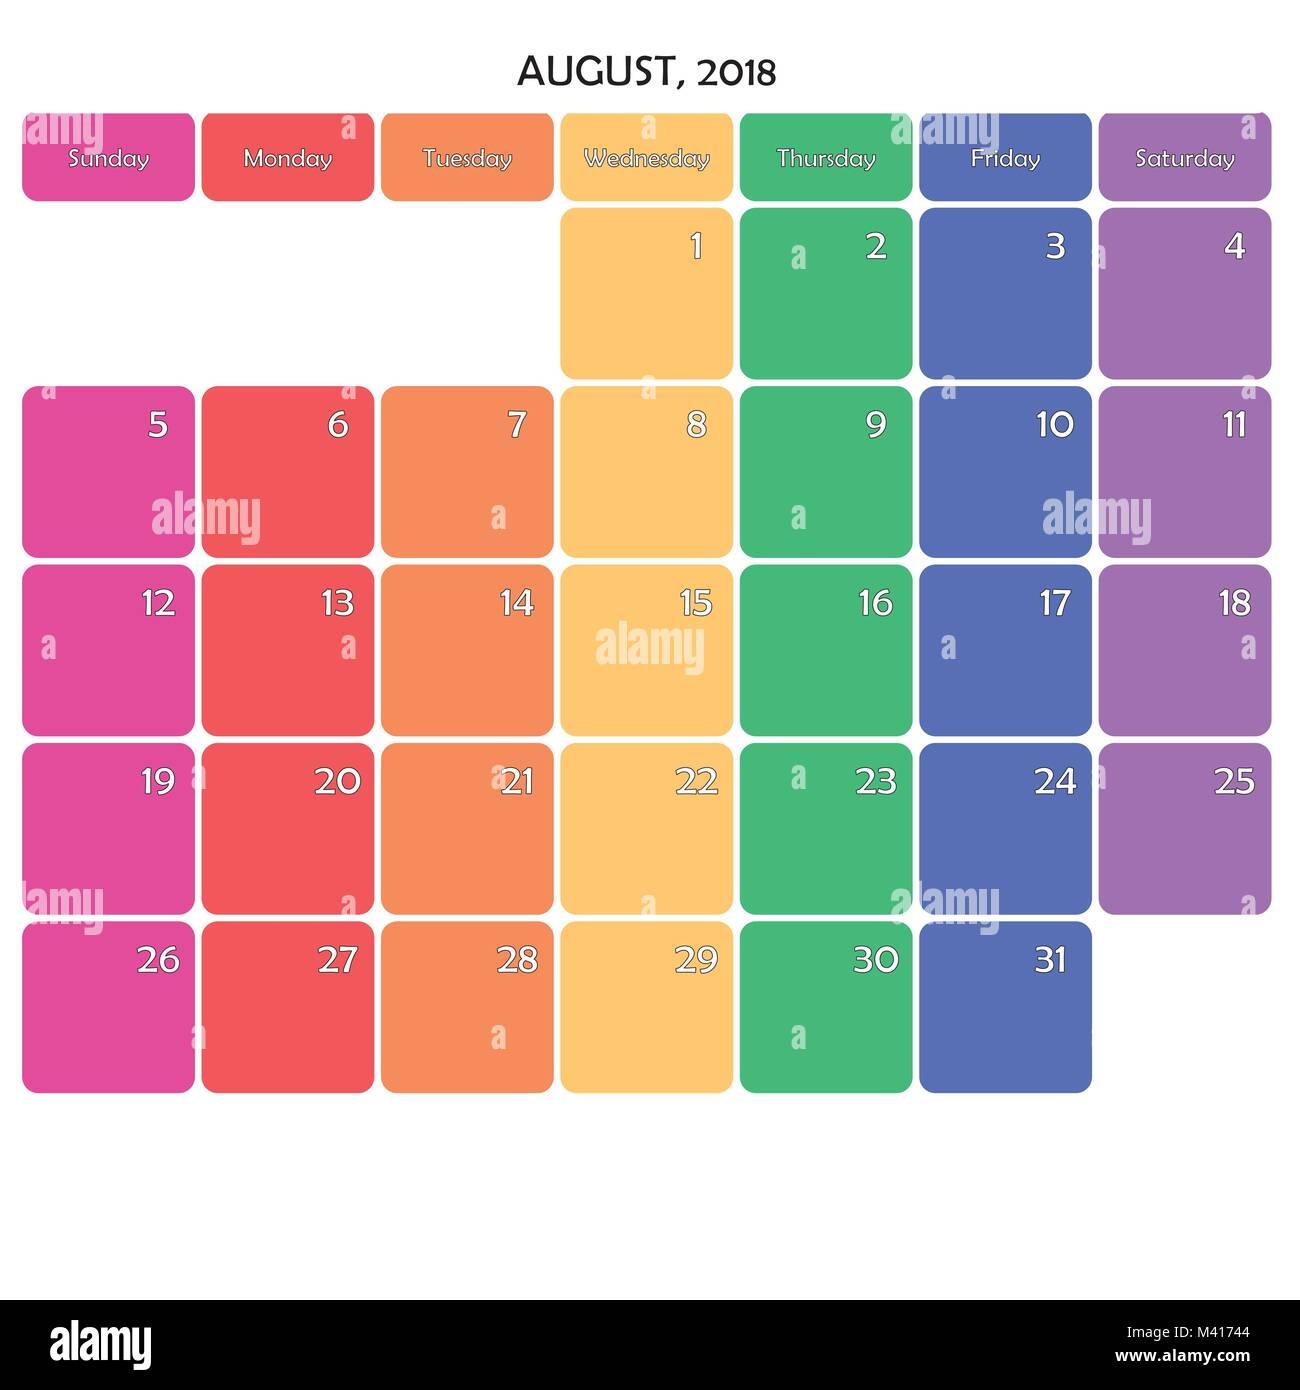 Big Calendar Planner : August planner calendar big editable note space